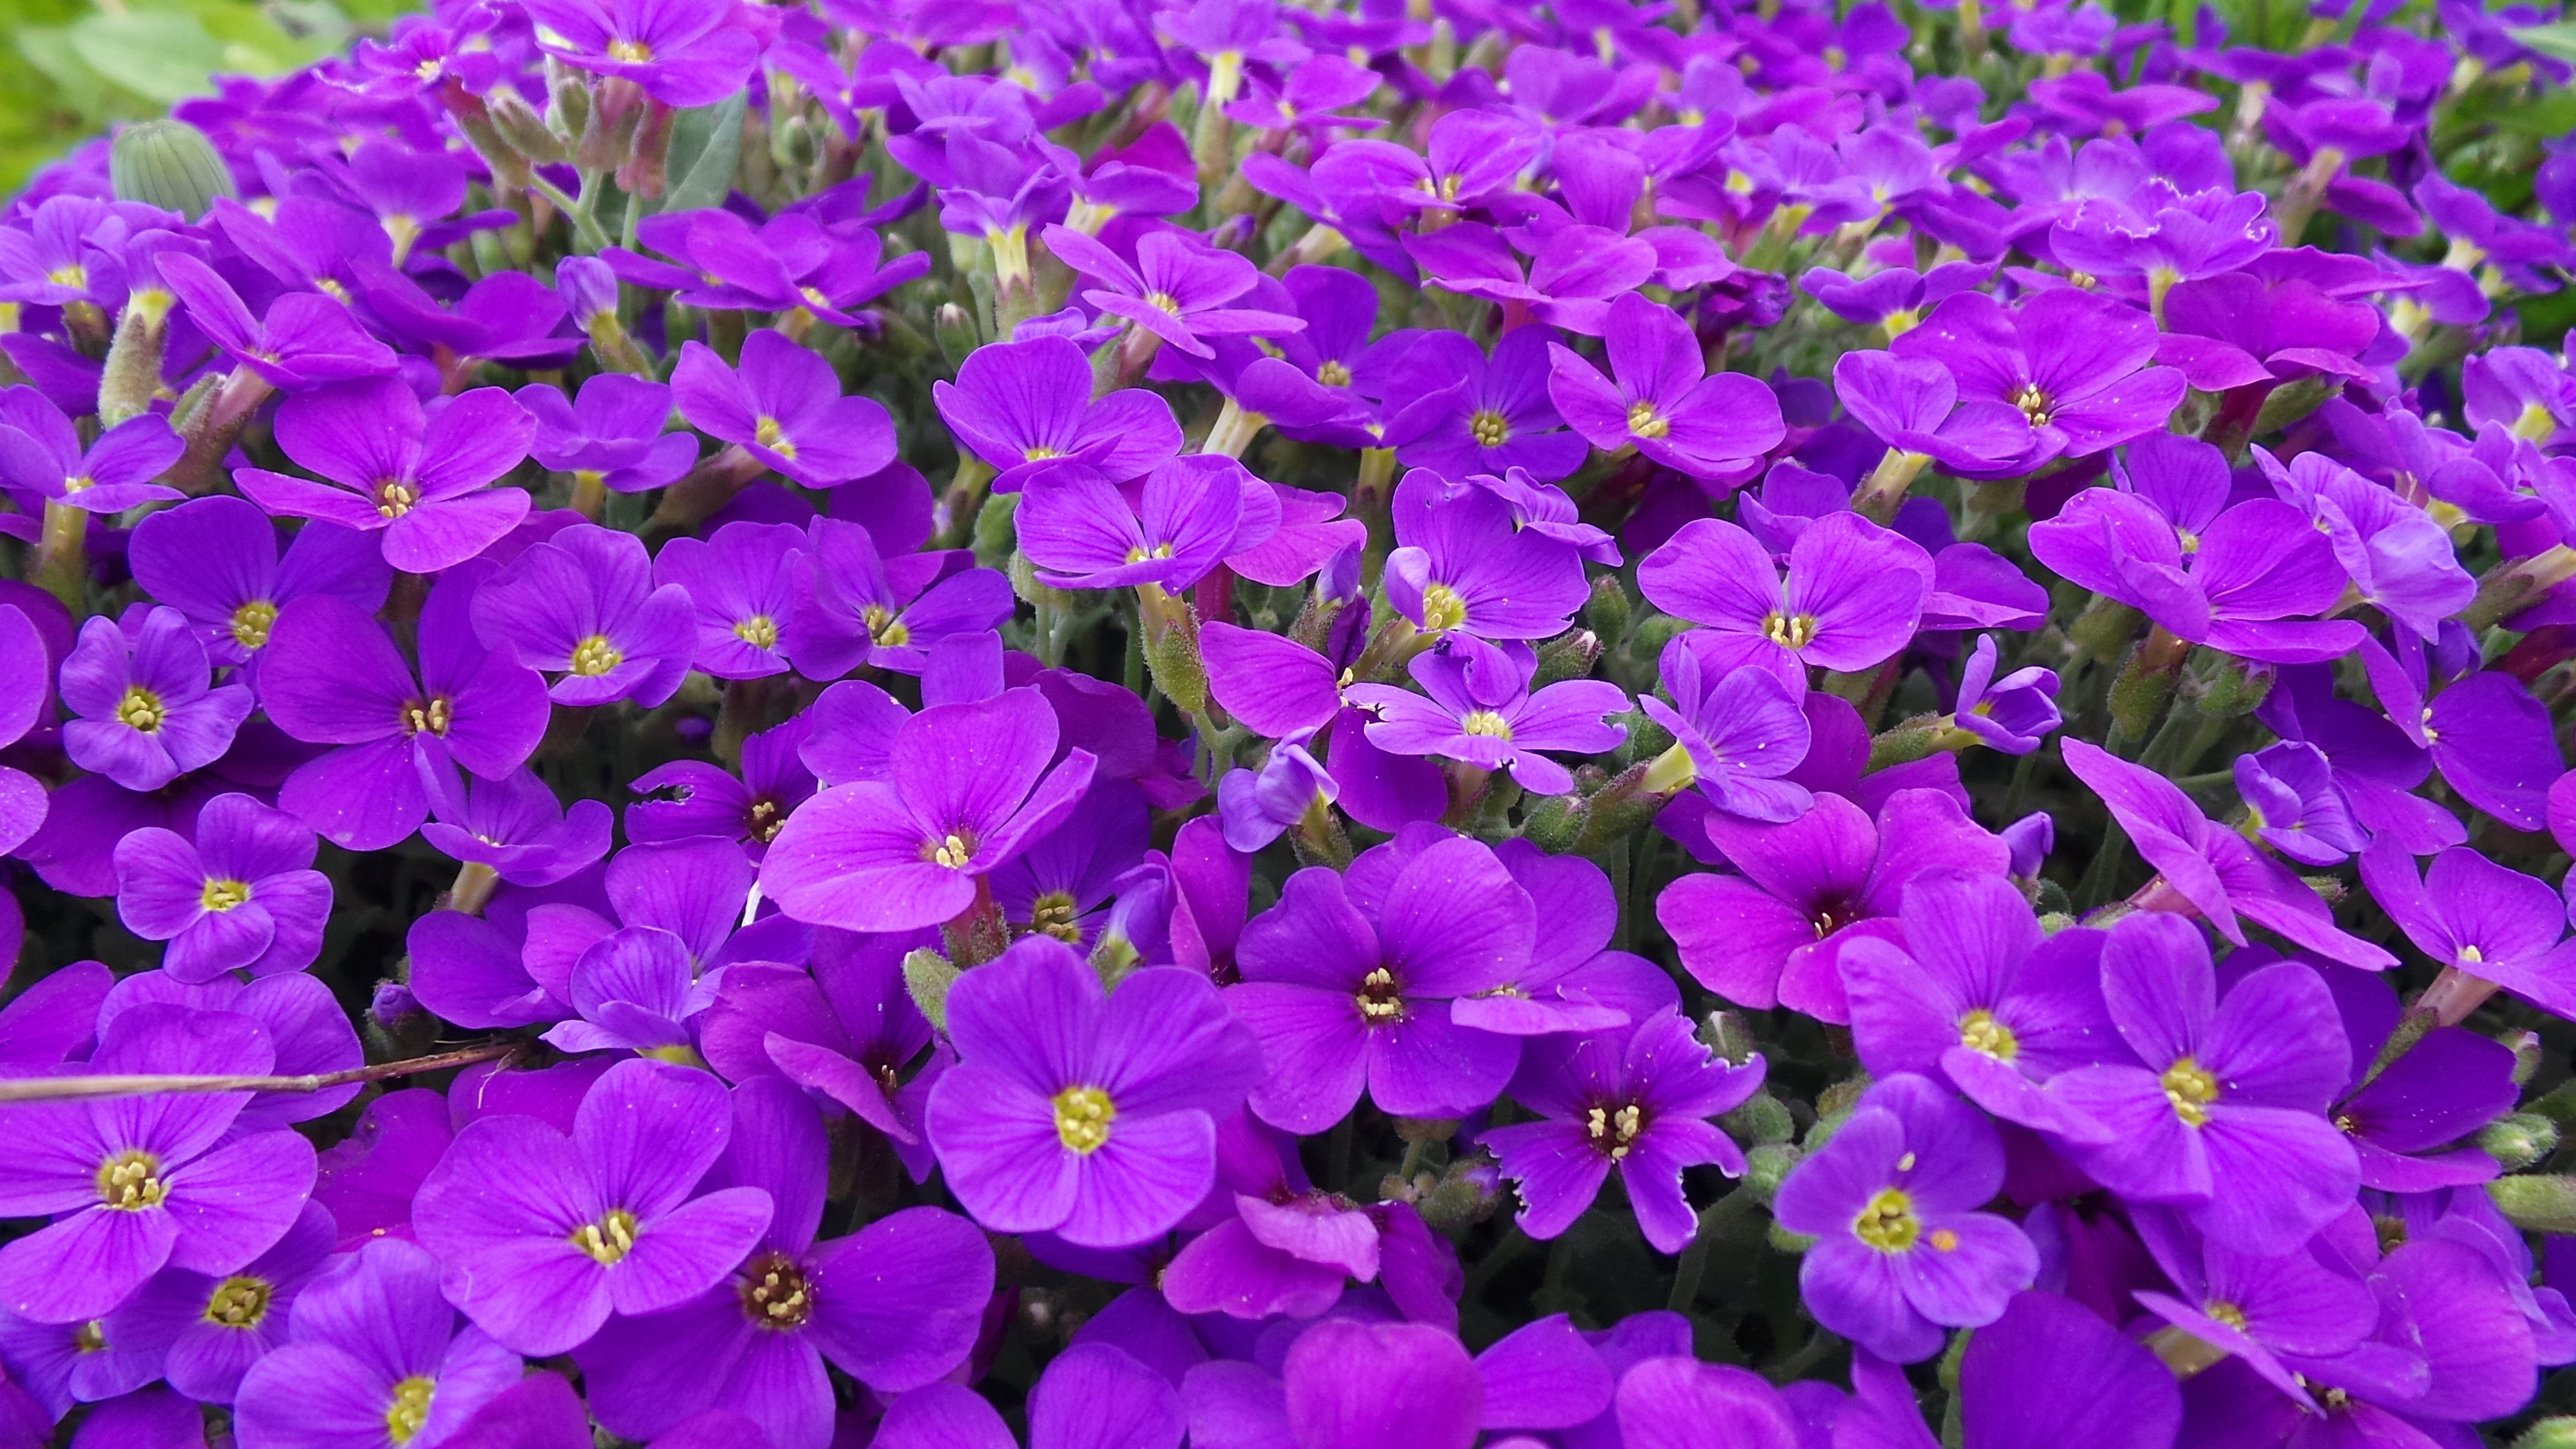 kostenlose foto bl hen lila bl tenblatt fr hling schlie en flora wildblume violett. Black Bedroom Furniture Sets. Home Design Ideas